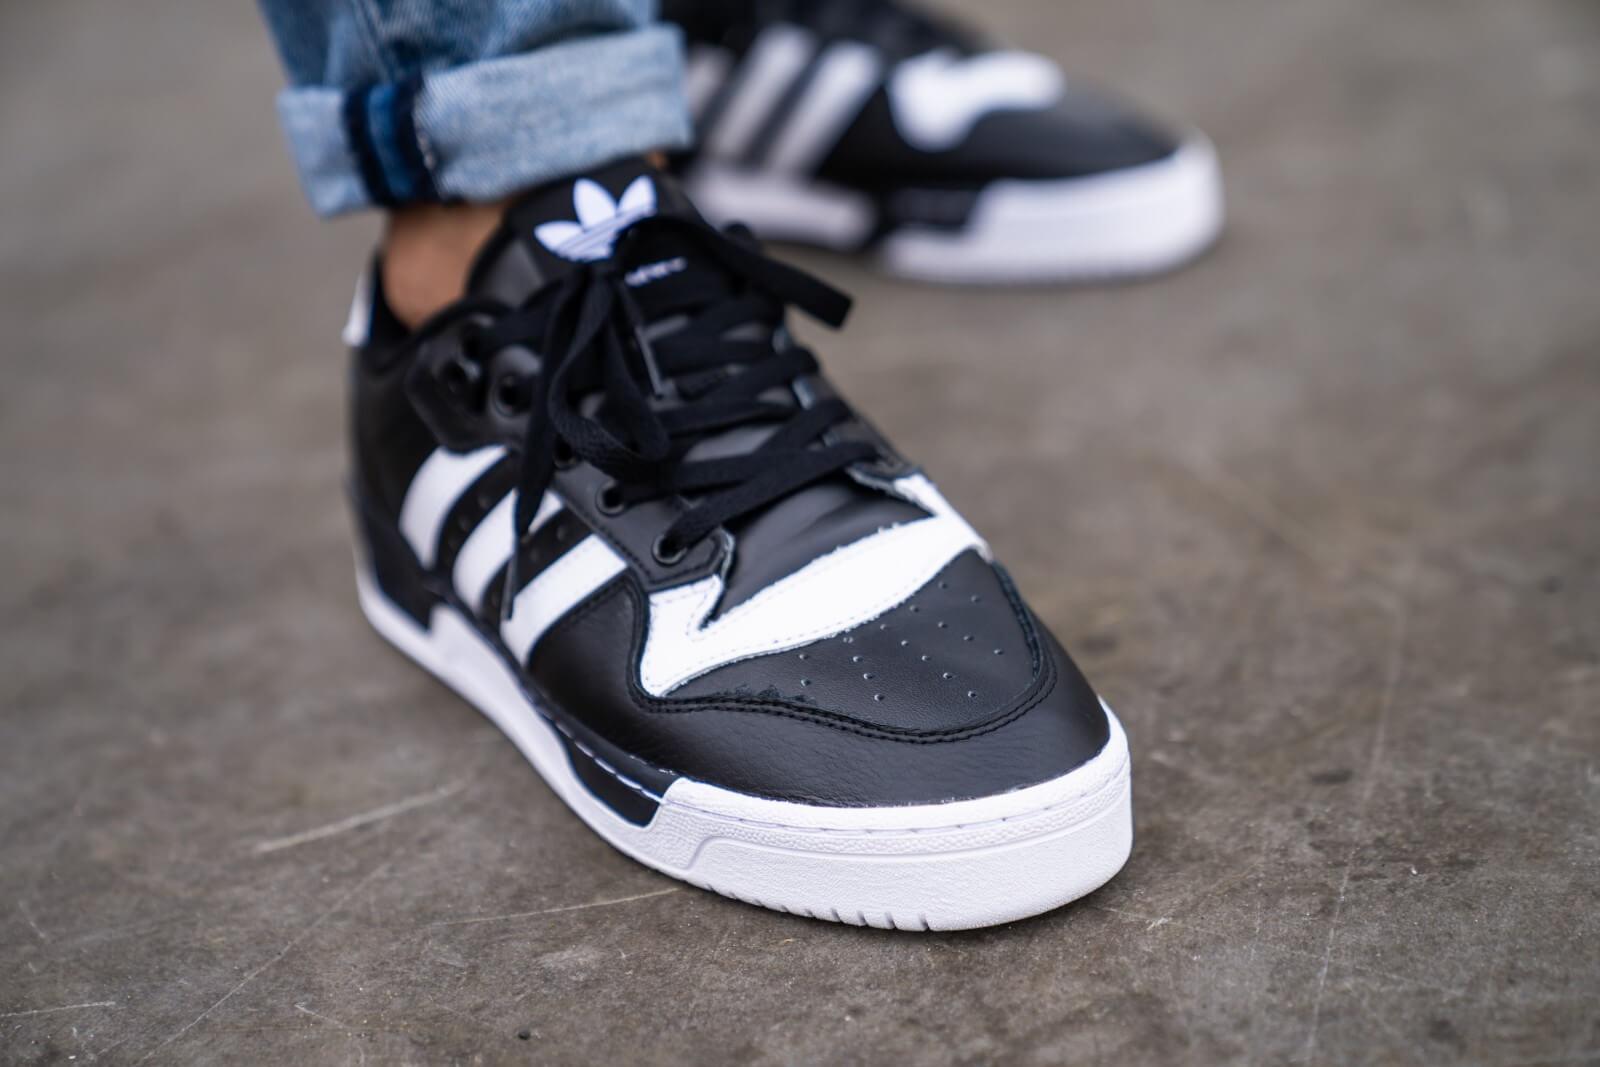 Adidas Rivalry Low Core BlackFootwear White EG8063